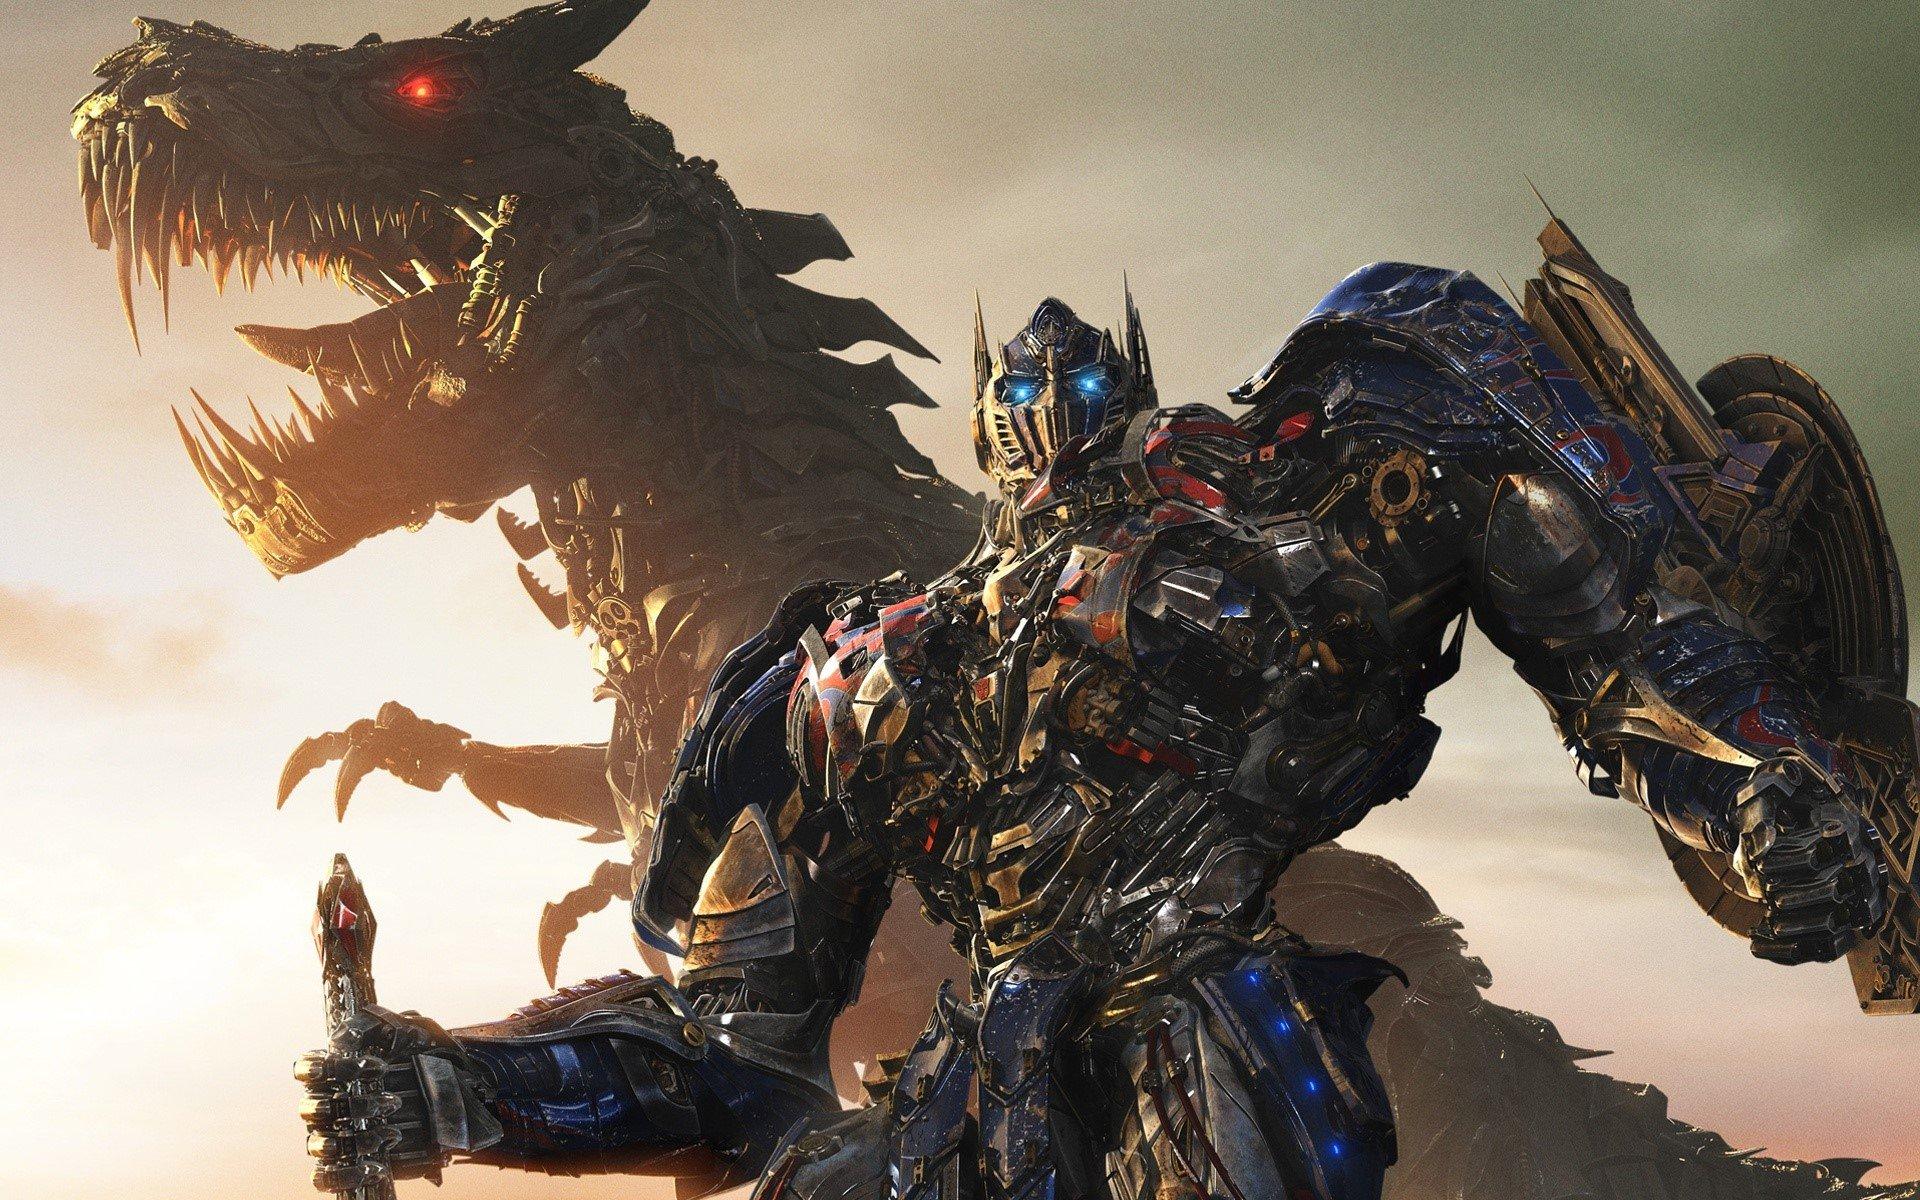 Fondos de pantalla Transformers Age of extinction Imax Poster